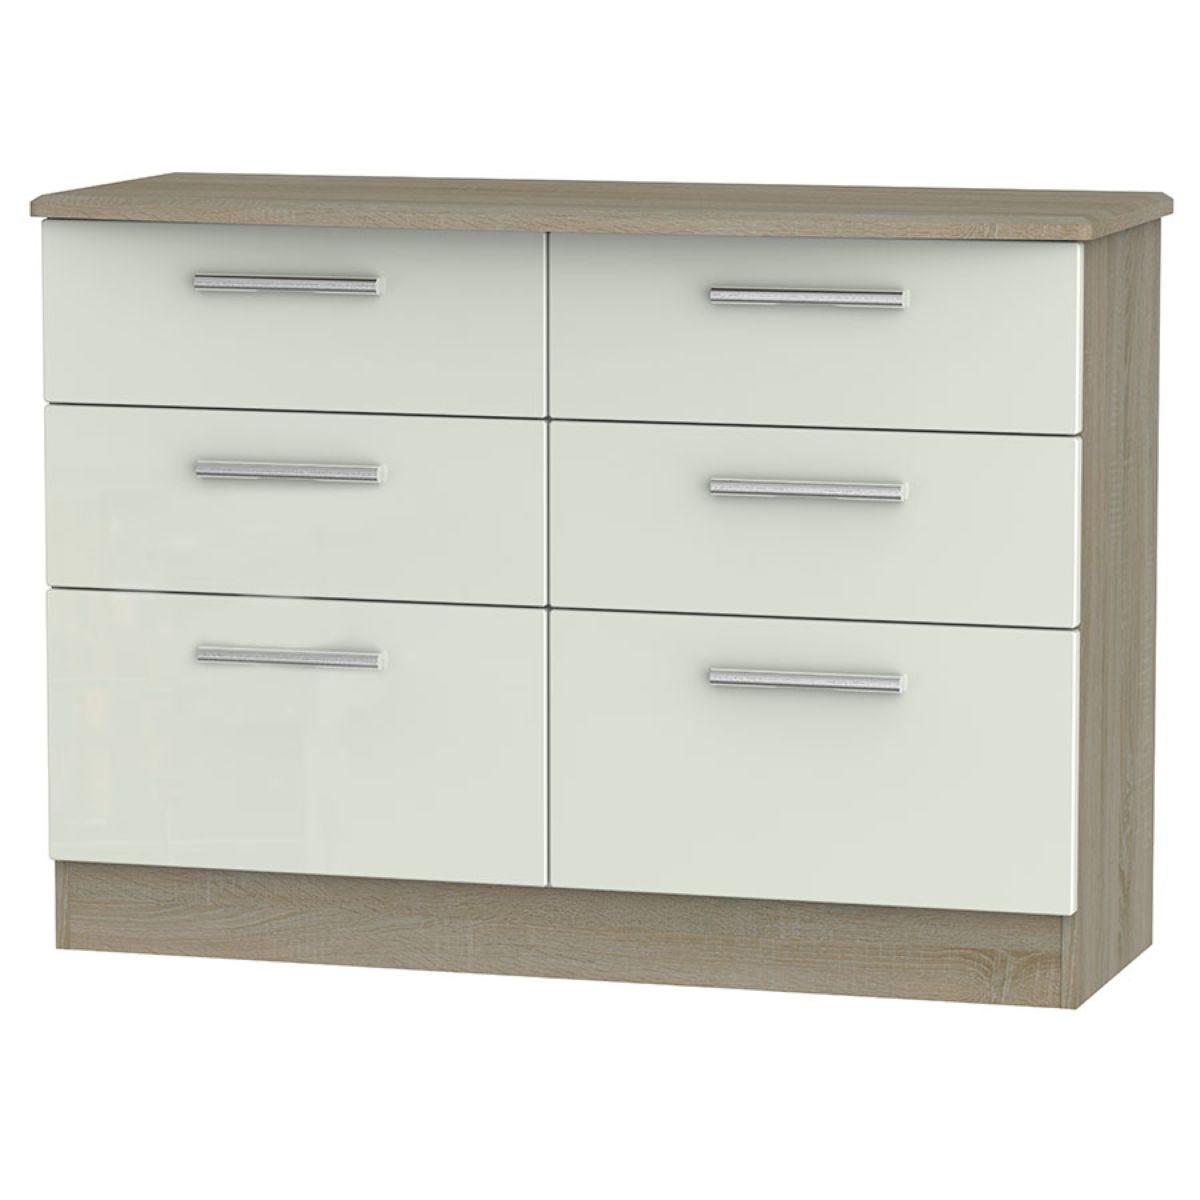 Kirkhill 6-Drawer Midi Chest of Drawers - Taupe Cedar